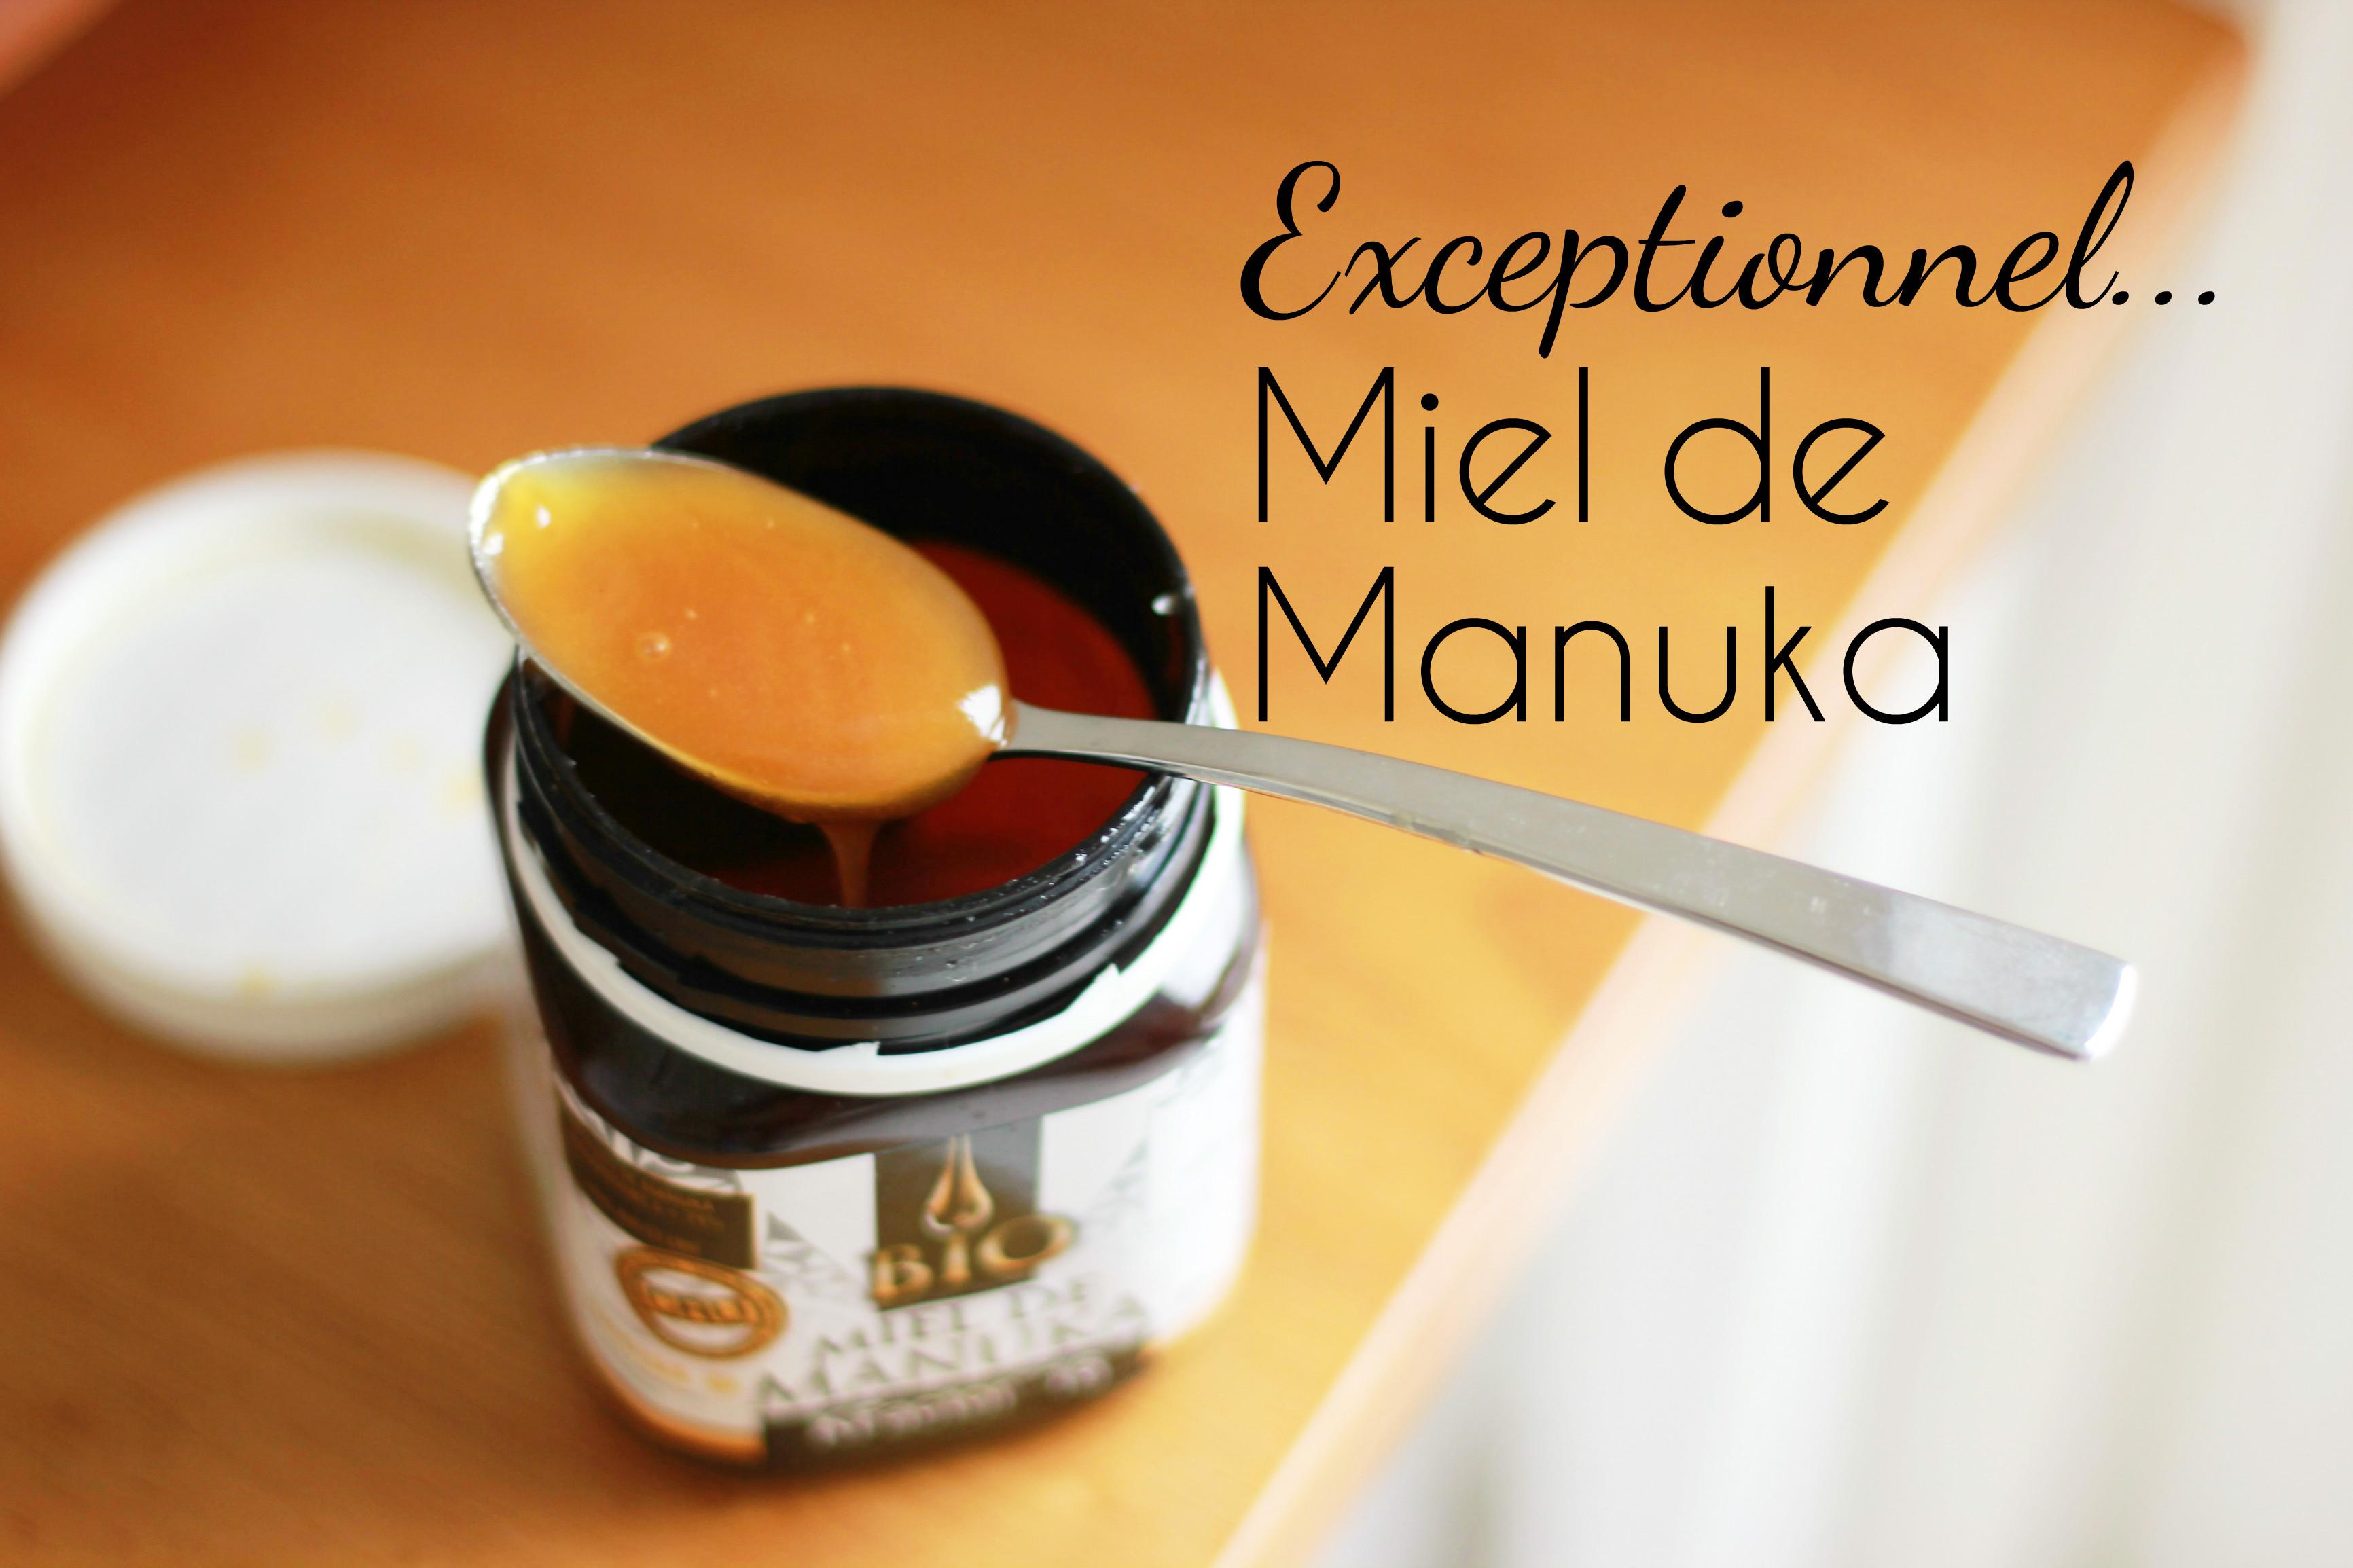 miel de manuka bio bienfaits